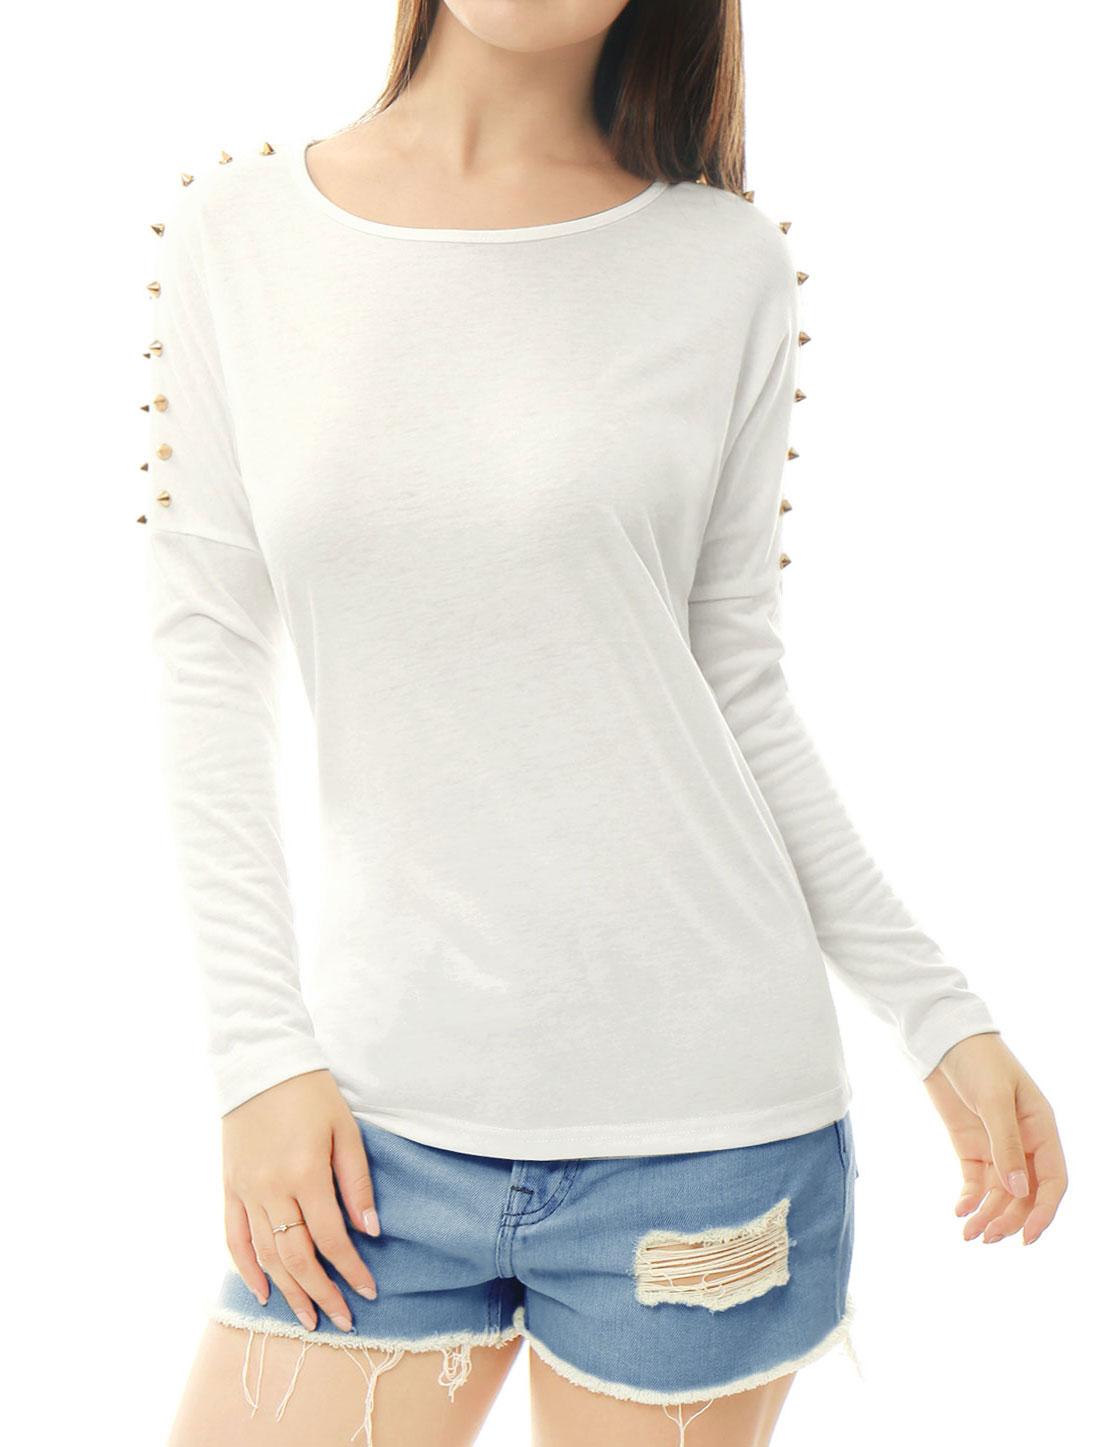 Women Round Neck Studs Decor Long Dolman Sleeves Top White XS